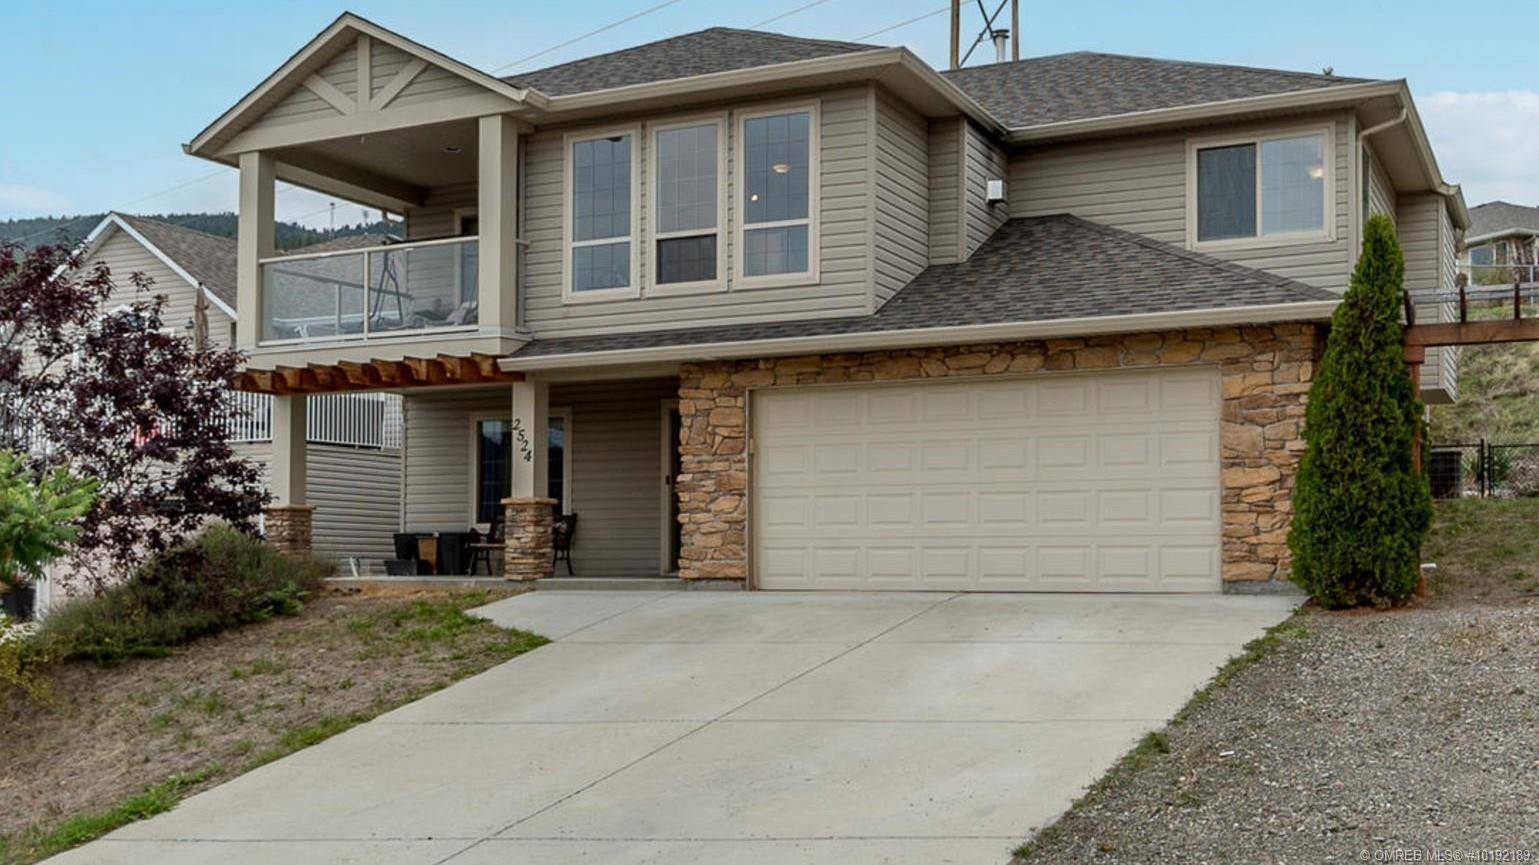 House for sale at 2524 Rhinestone Rd West Kelowna British Columbia - MLS: 10192189